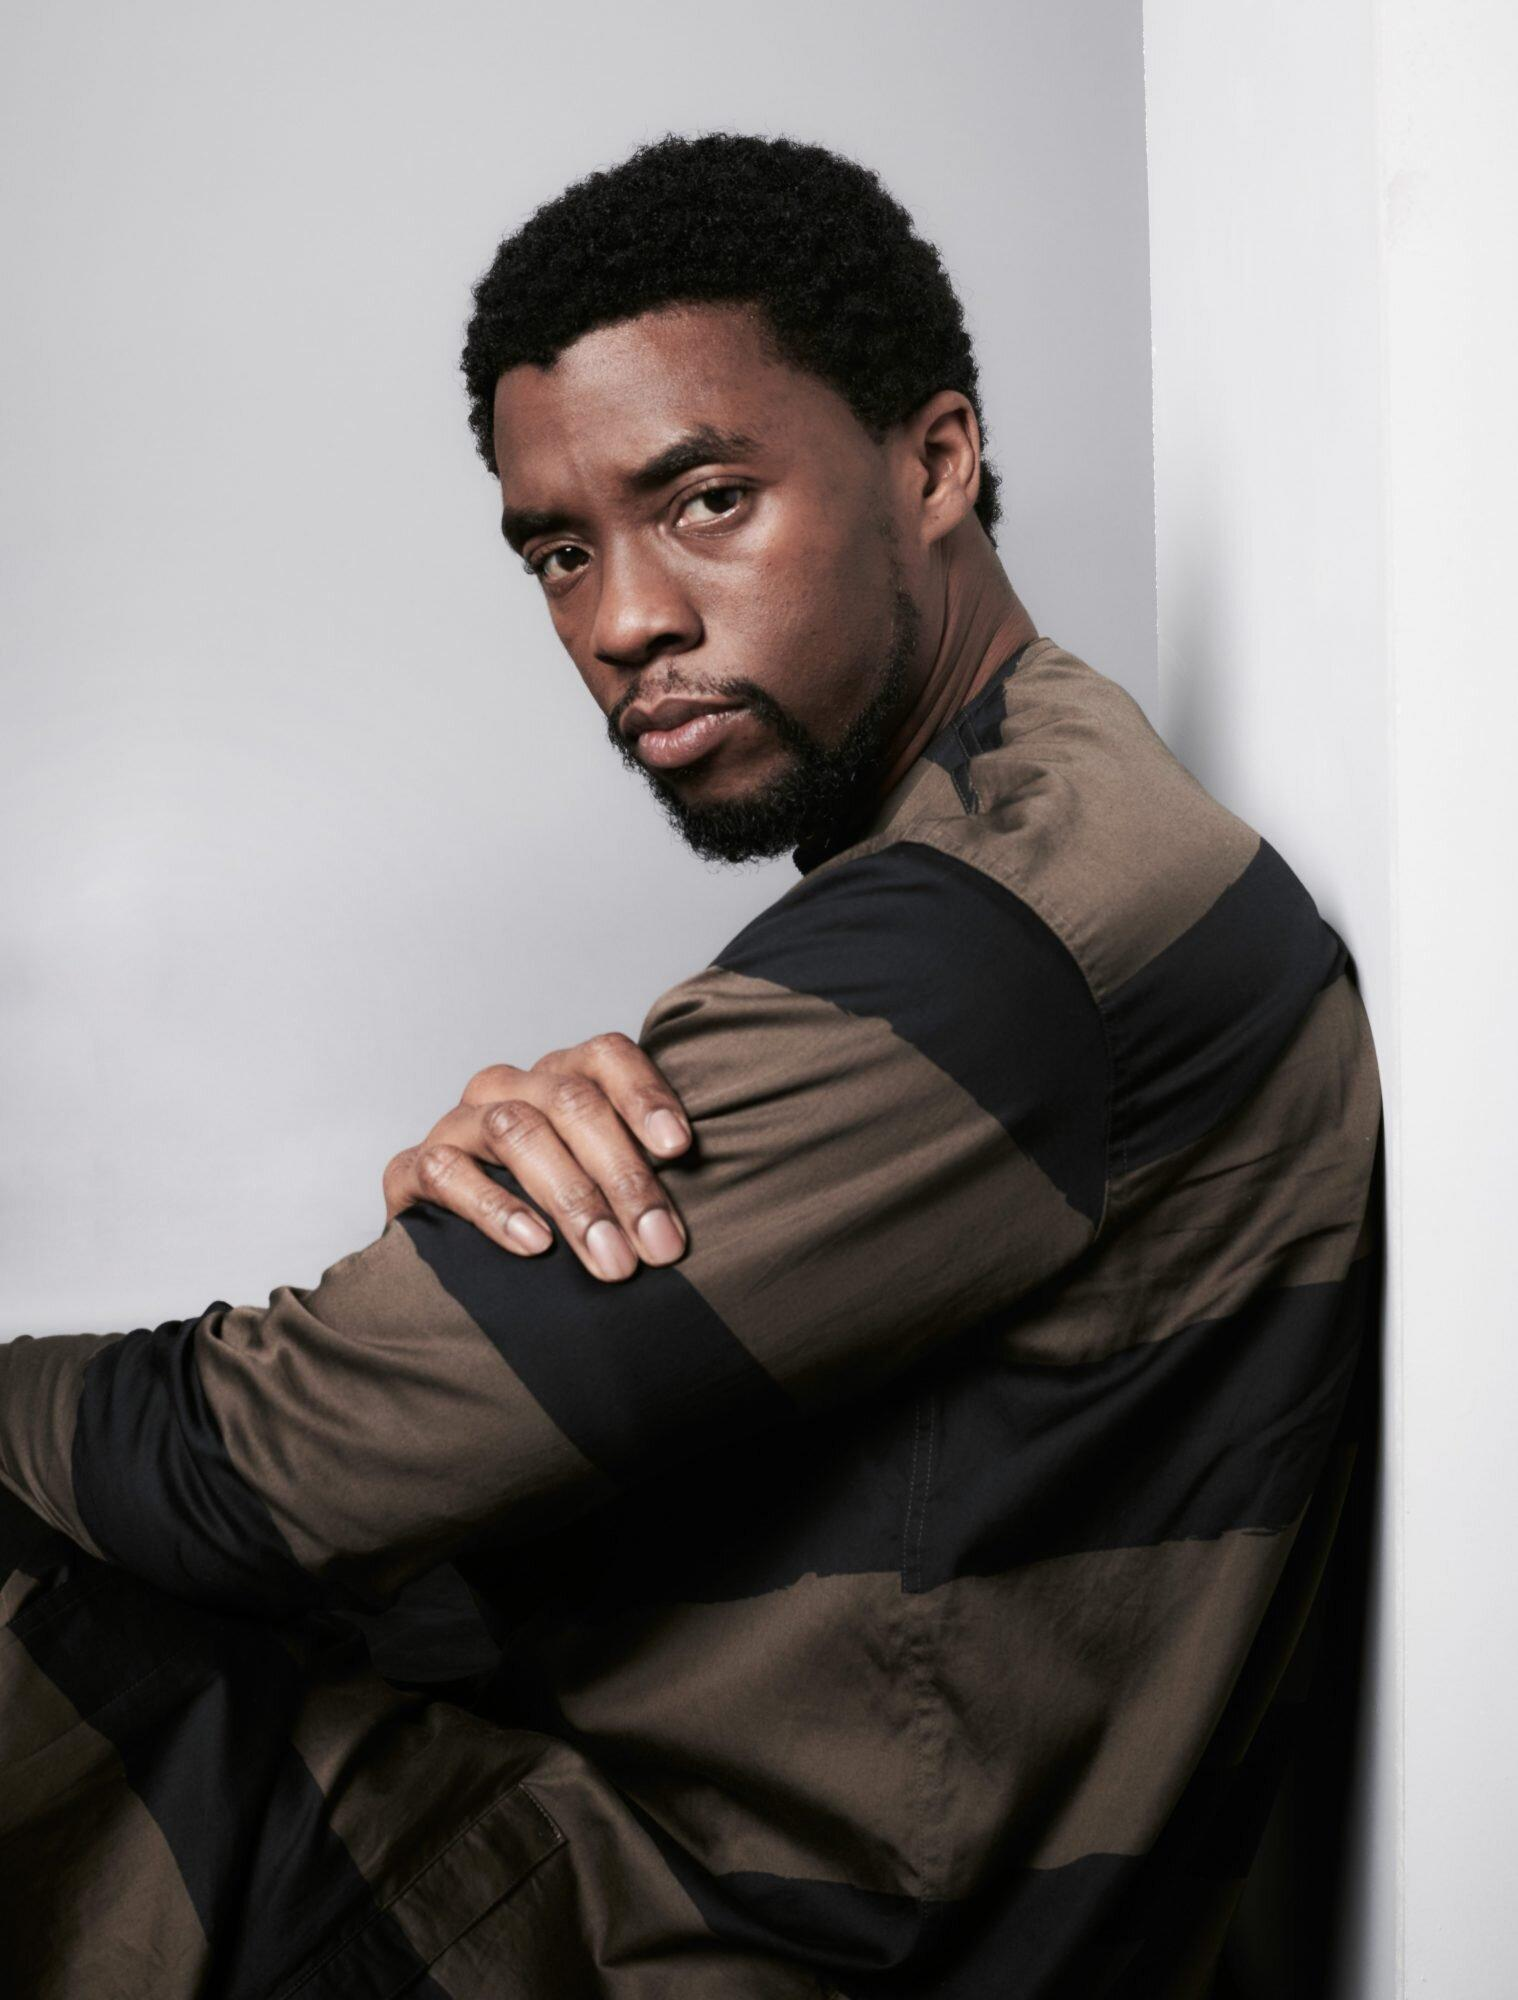 Jamie Foxx, Kamala Harris and More Stars Pay Tribute to Chadwick Boseman: 'What an Immense Talent' thumbnail